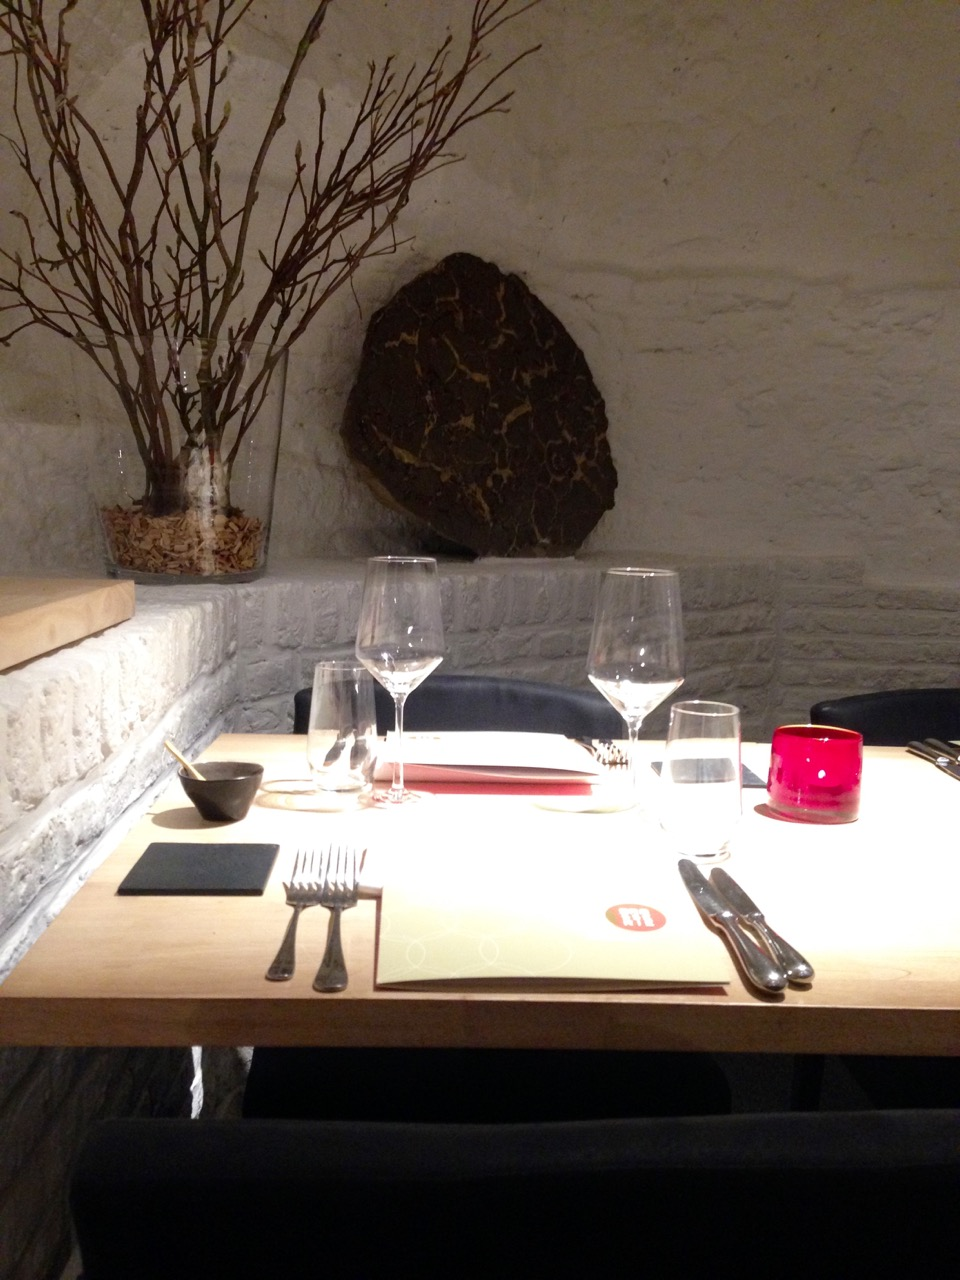 Restaurant Héliport Brasserie à Liège - Cadre